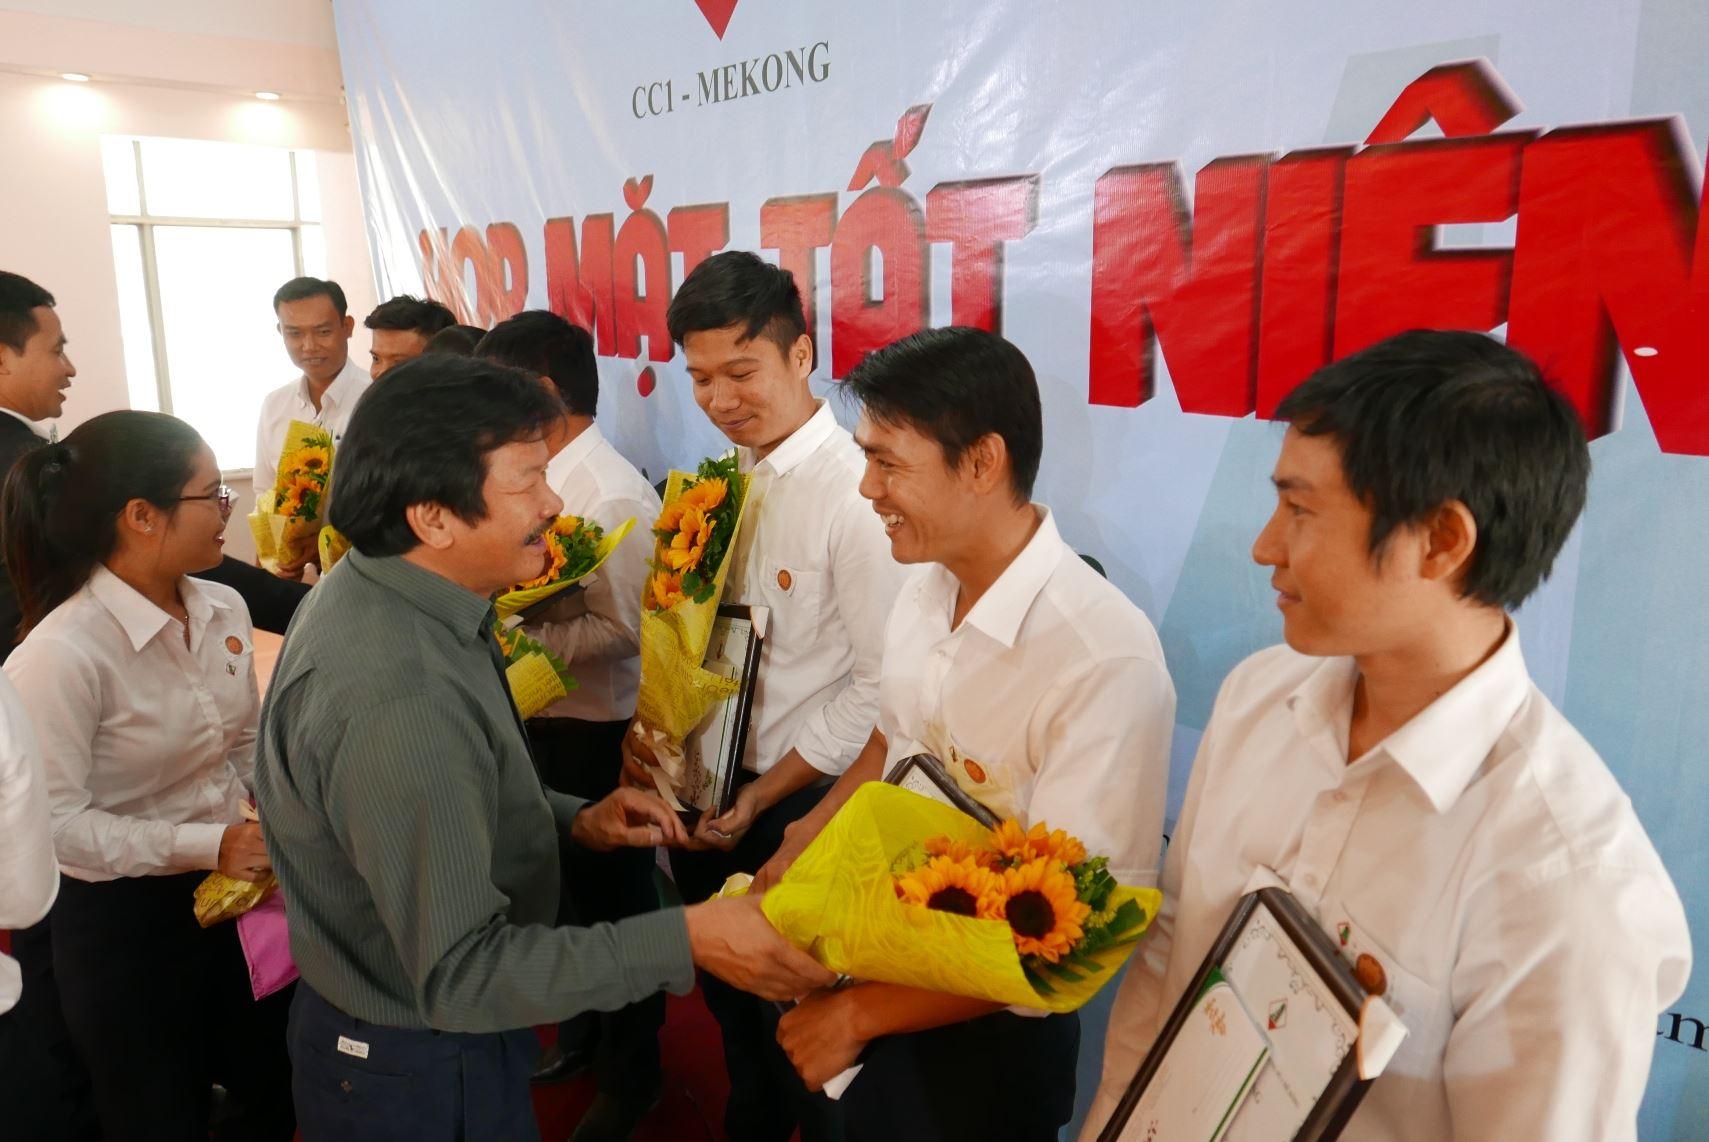 tat-nien-2019-cc1-mekong (16)